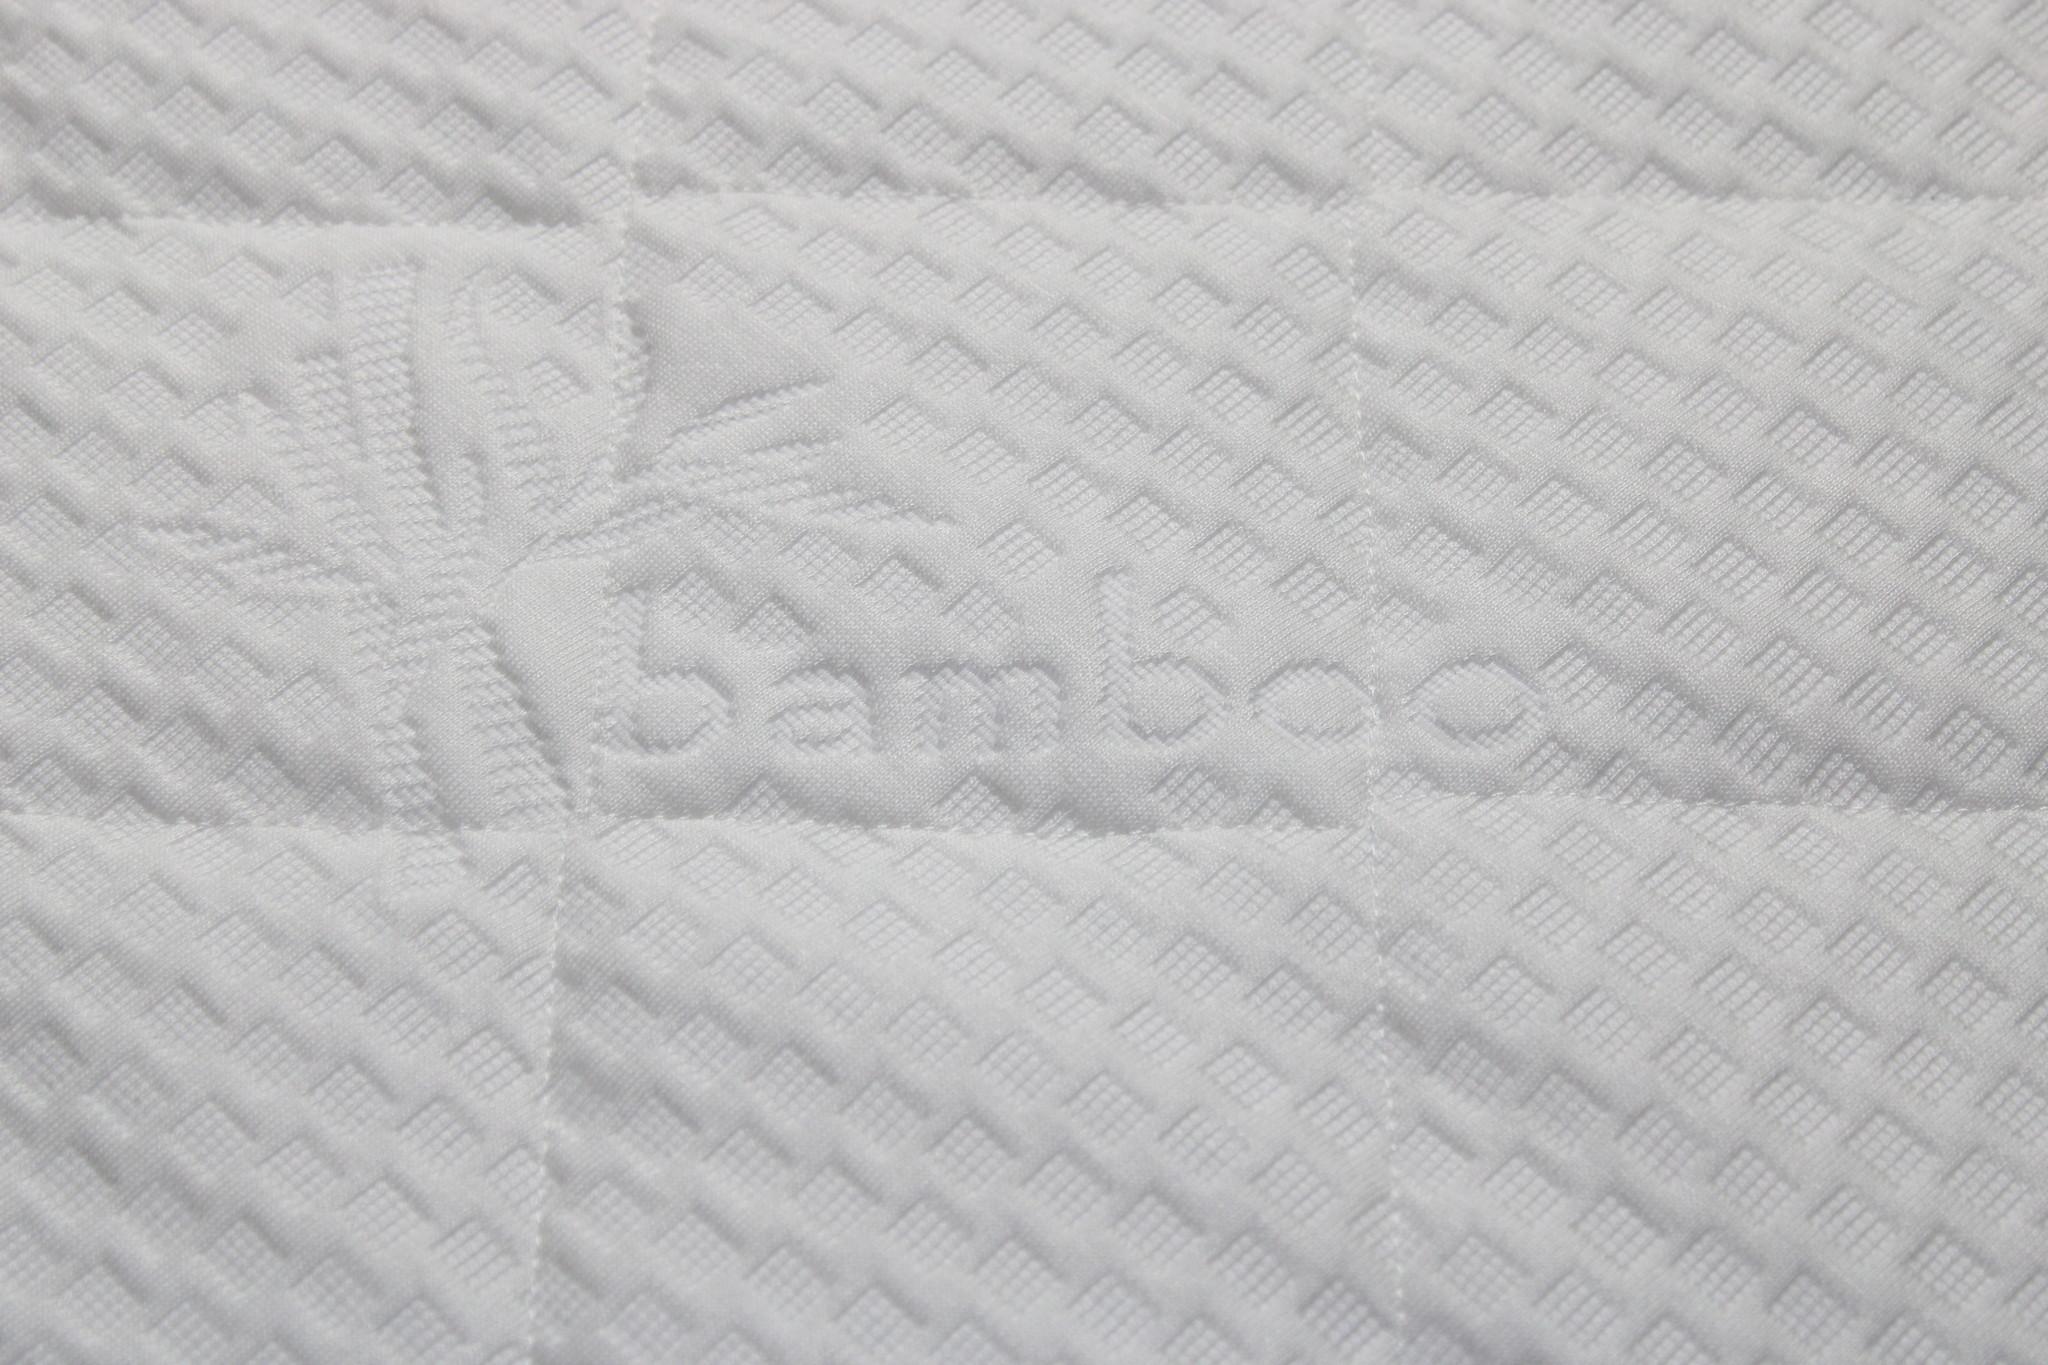 Sarpy Kindermatras 90x150 koudschuim HR55 bamboo